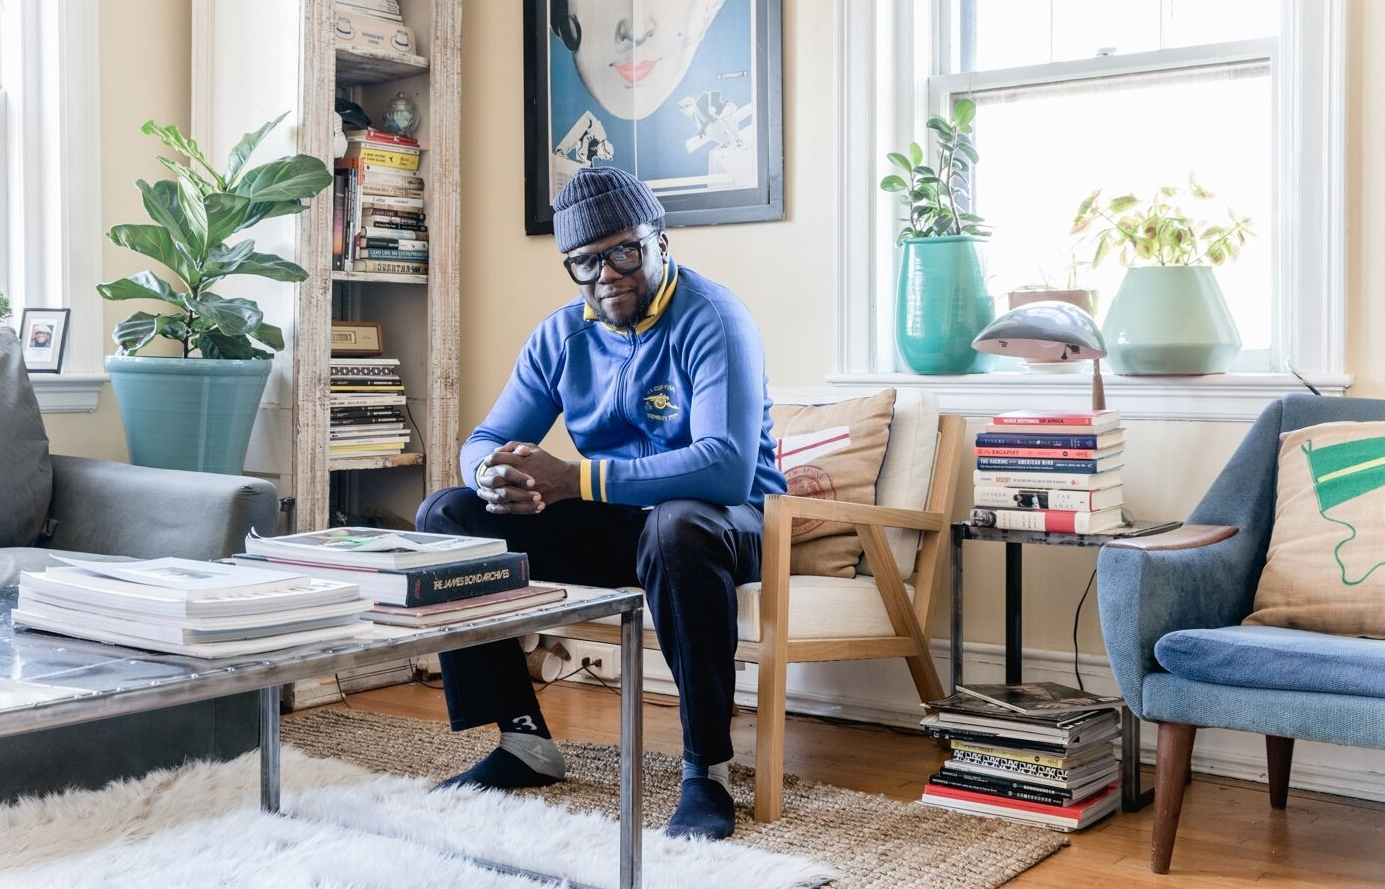 Kazeem Lawal - Sartorialist, entrepreneur, man about townPortland, Maine